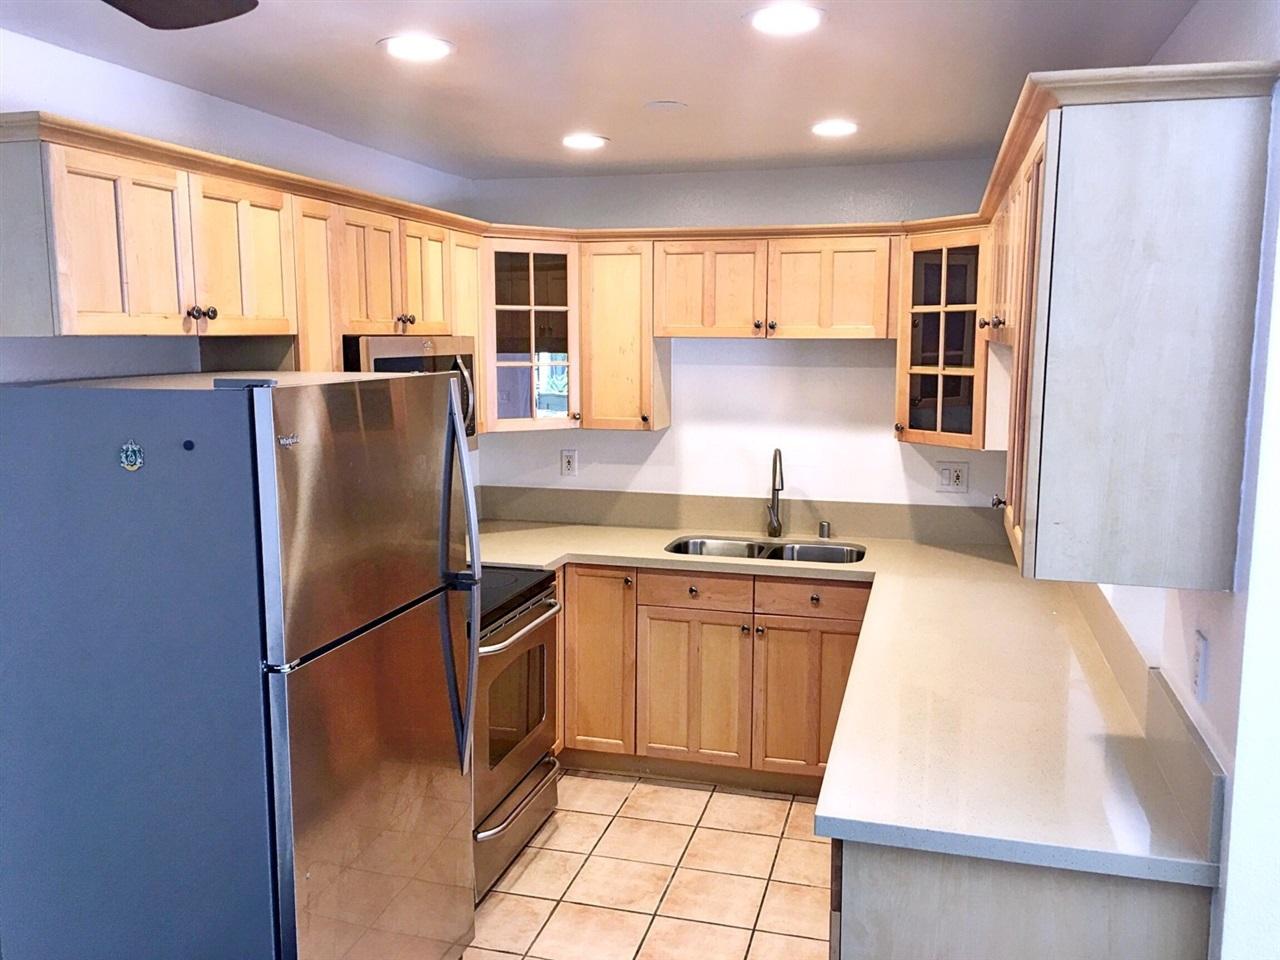 Telegraph Canyon Apartments In Chula Vista California - Best ...